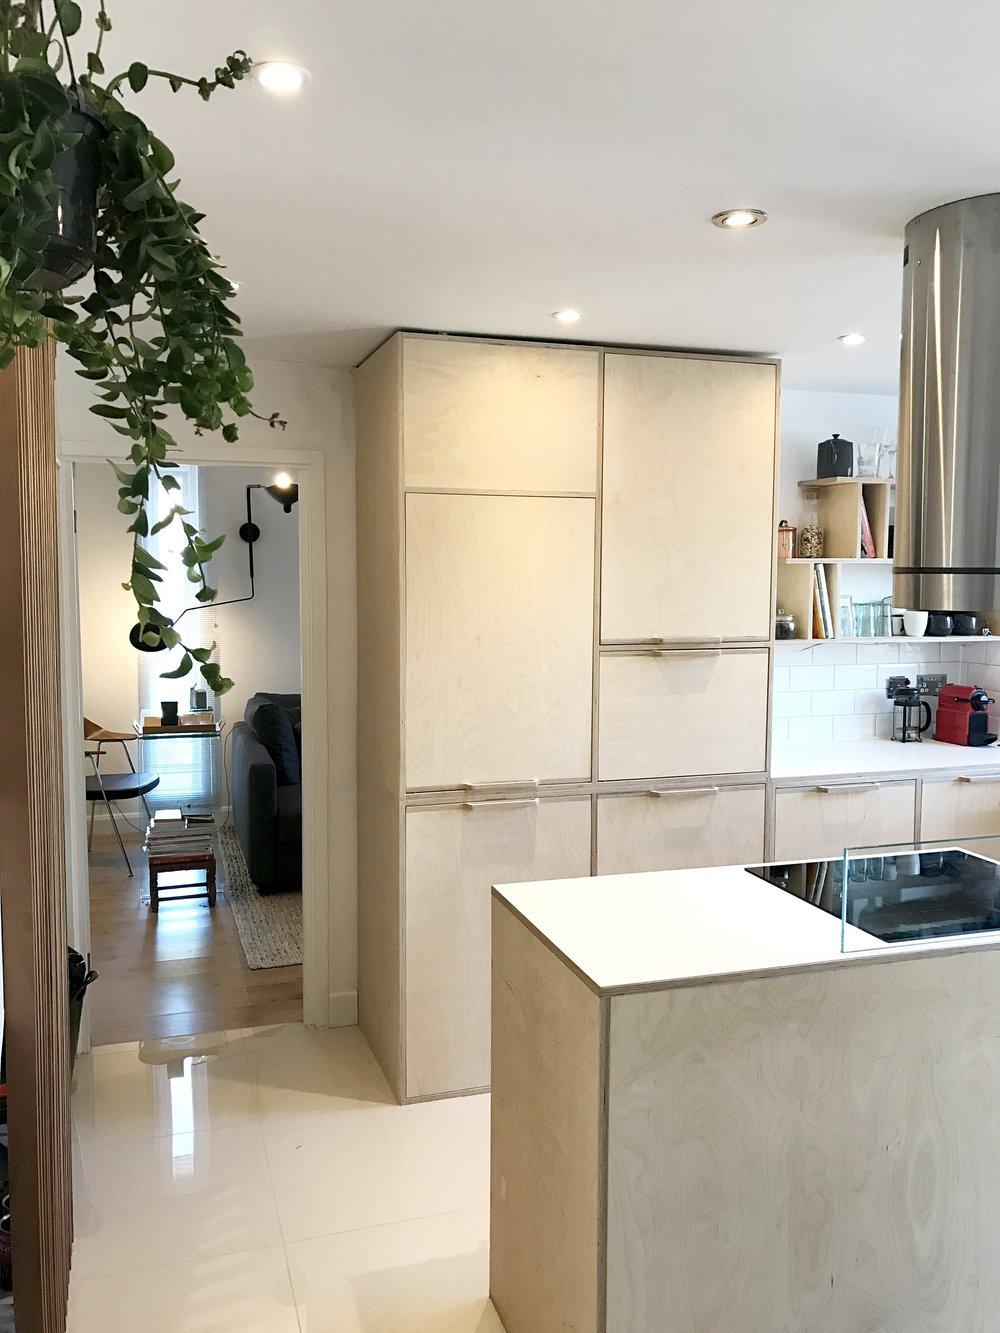 Lozi's birch kitchen design in shoreditch East London